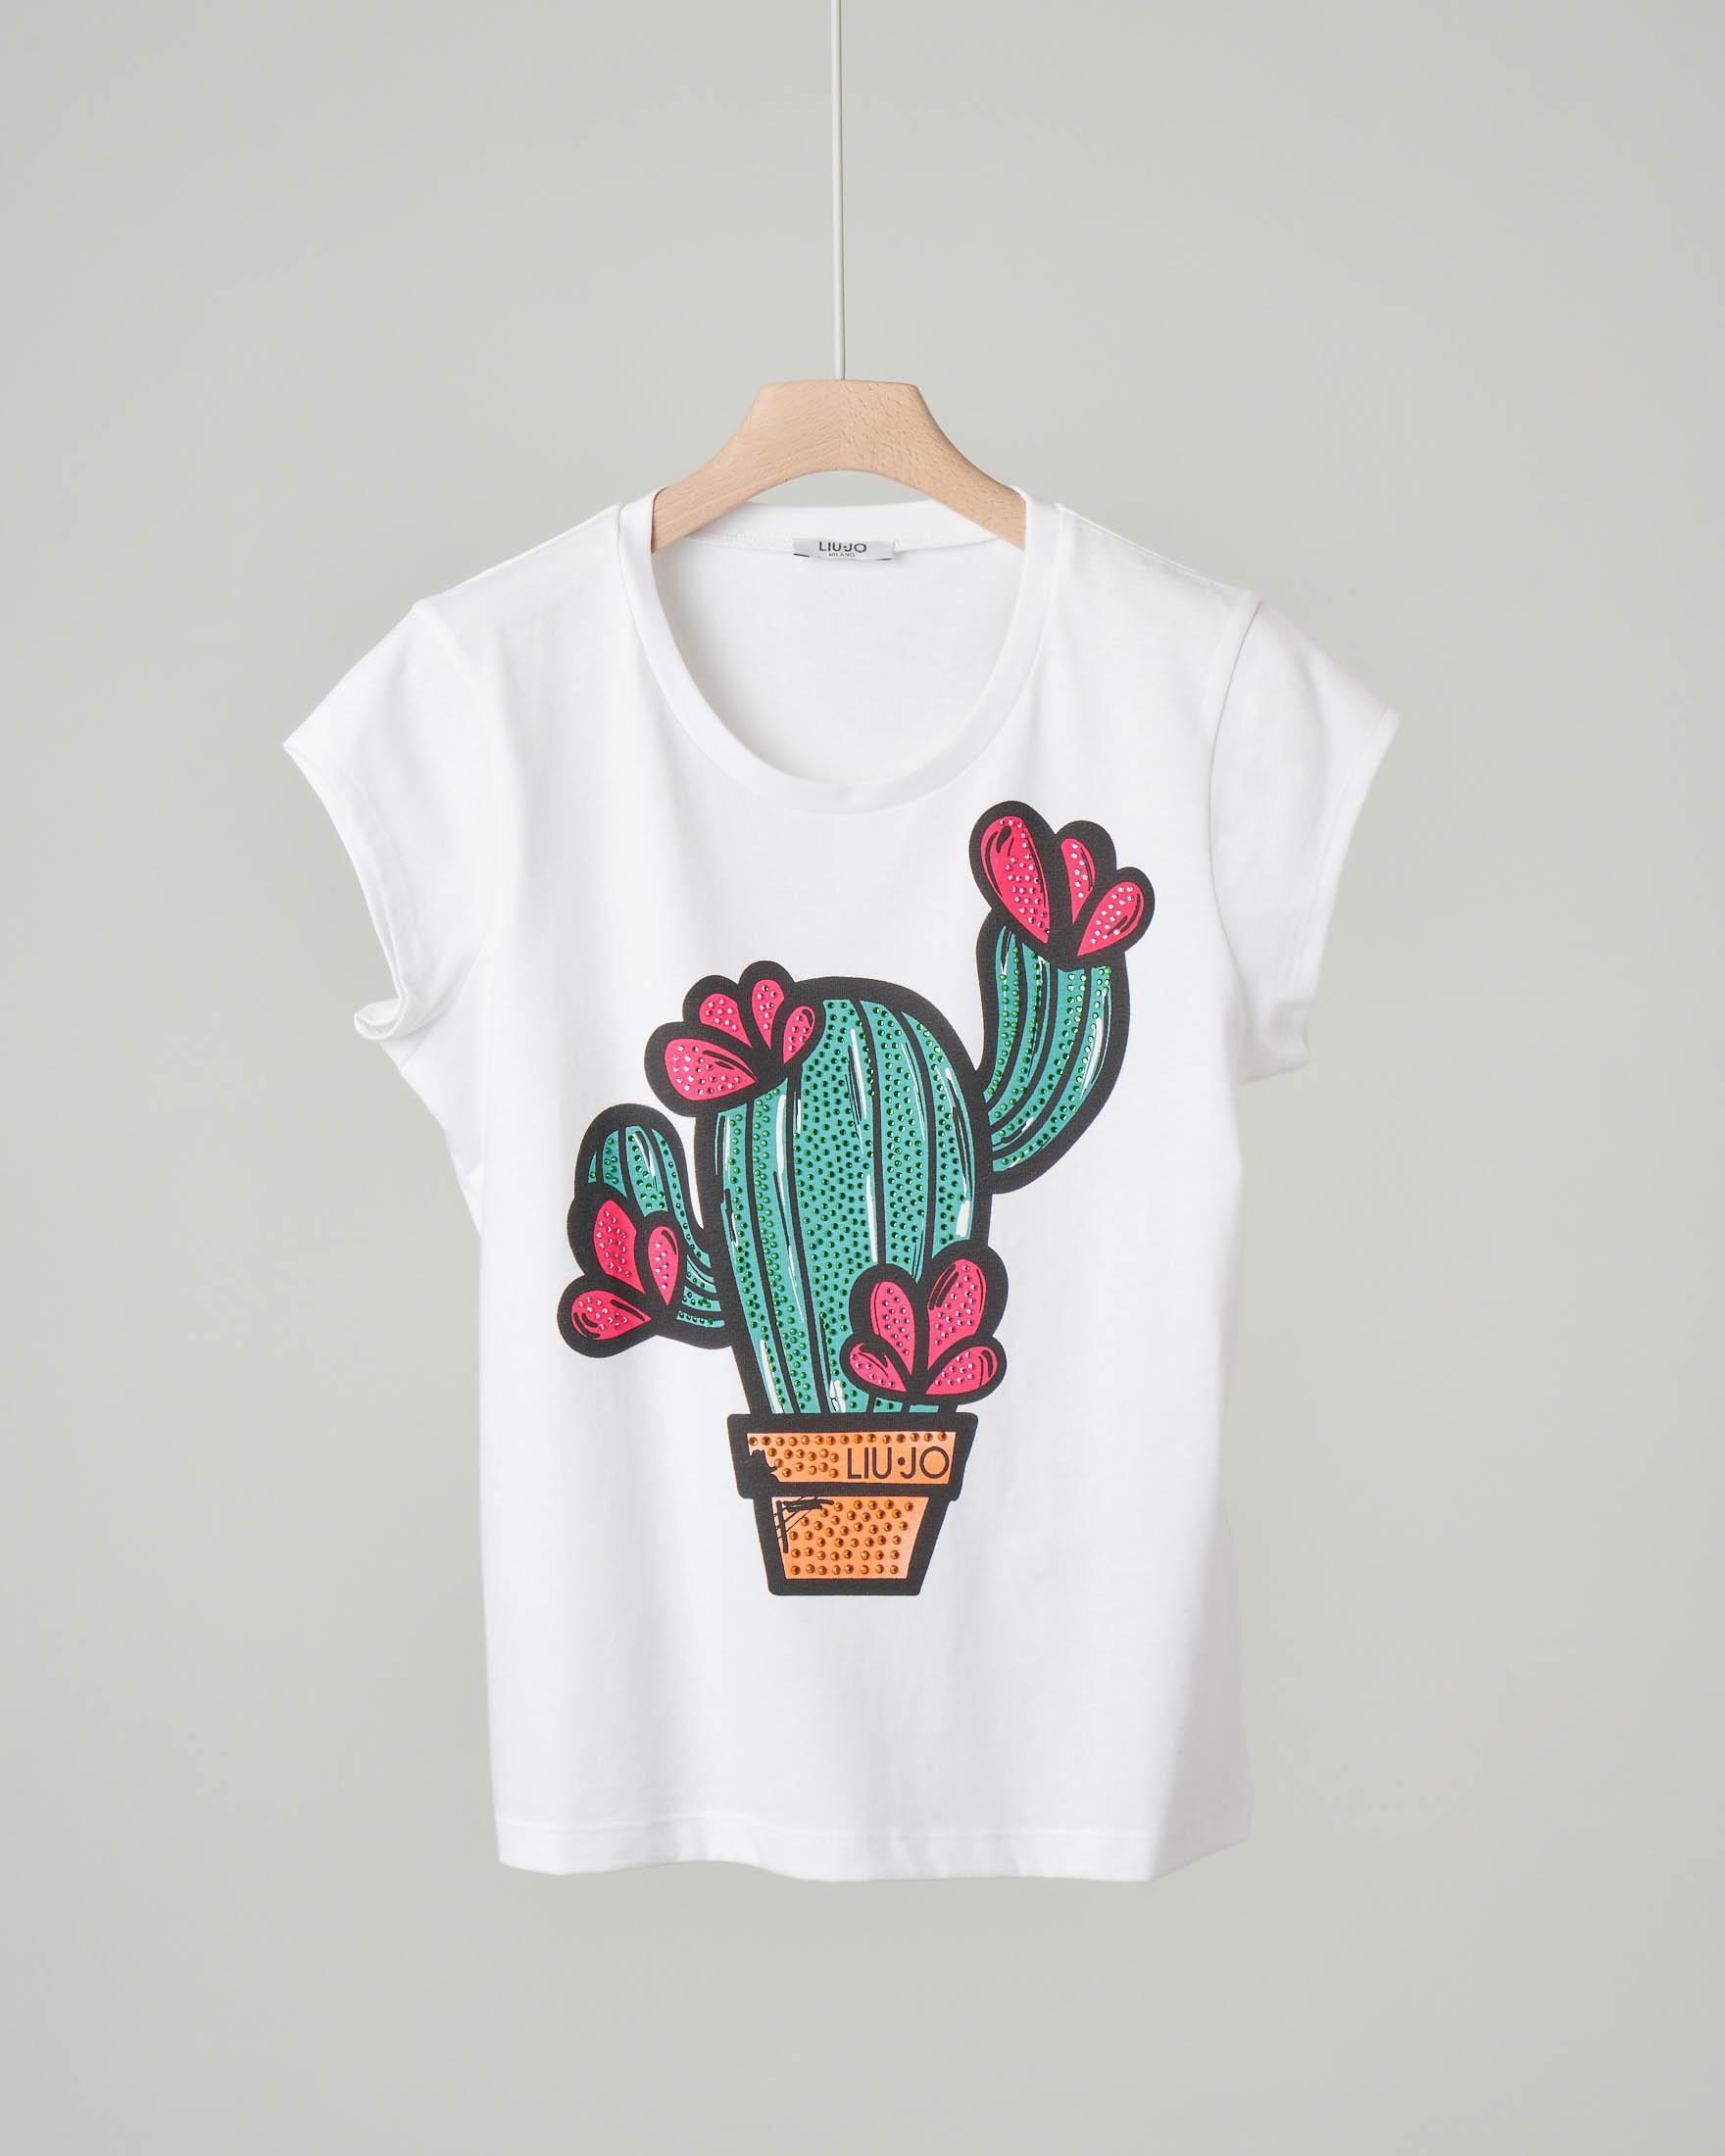 JO T-Shirt Bianca Stampa Cactus LIU